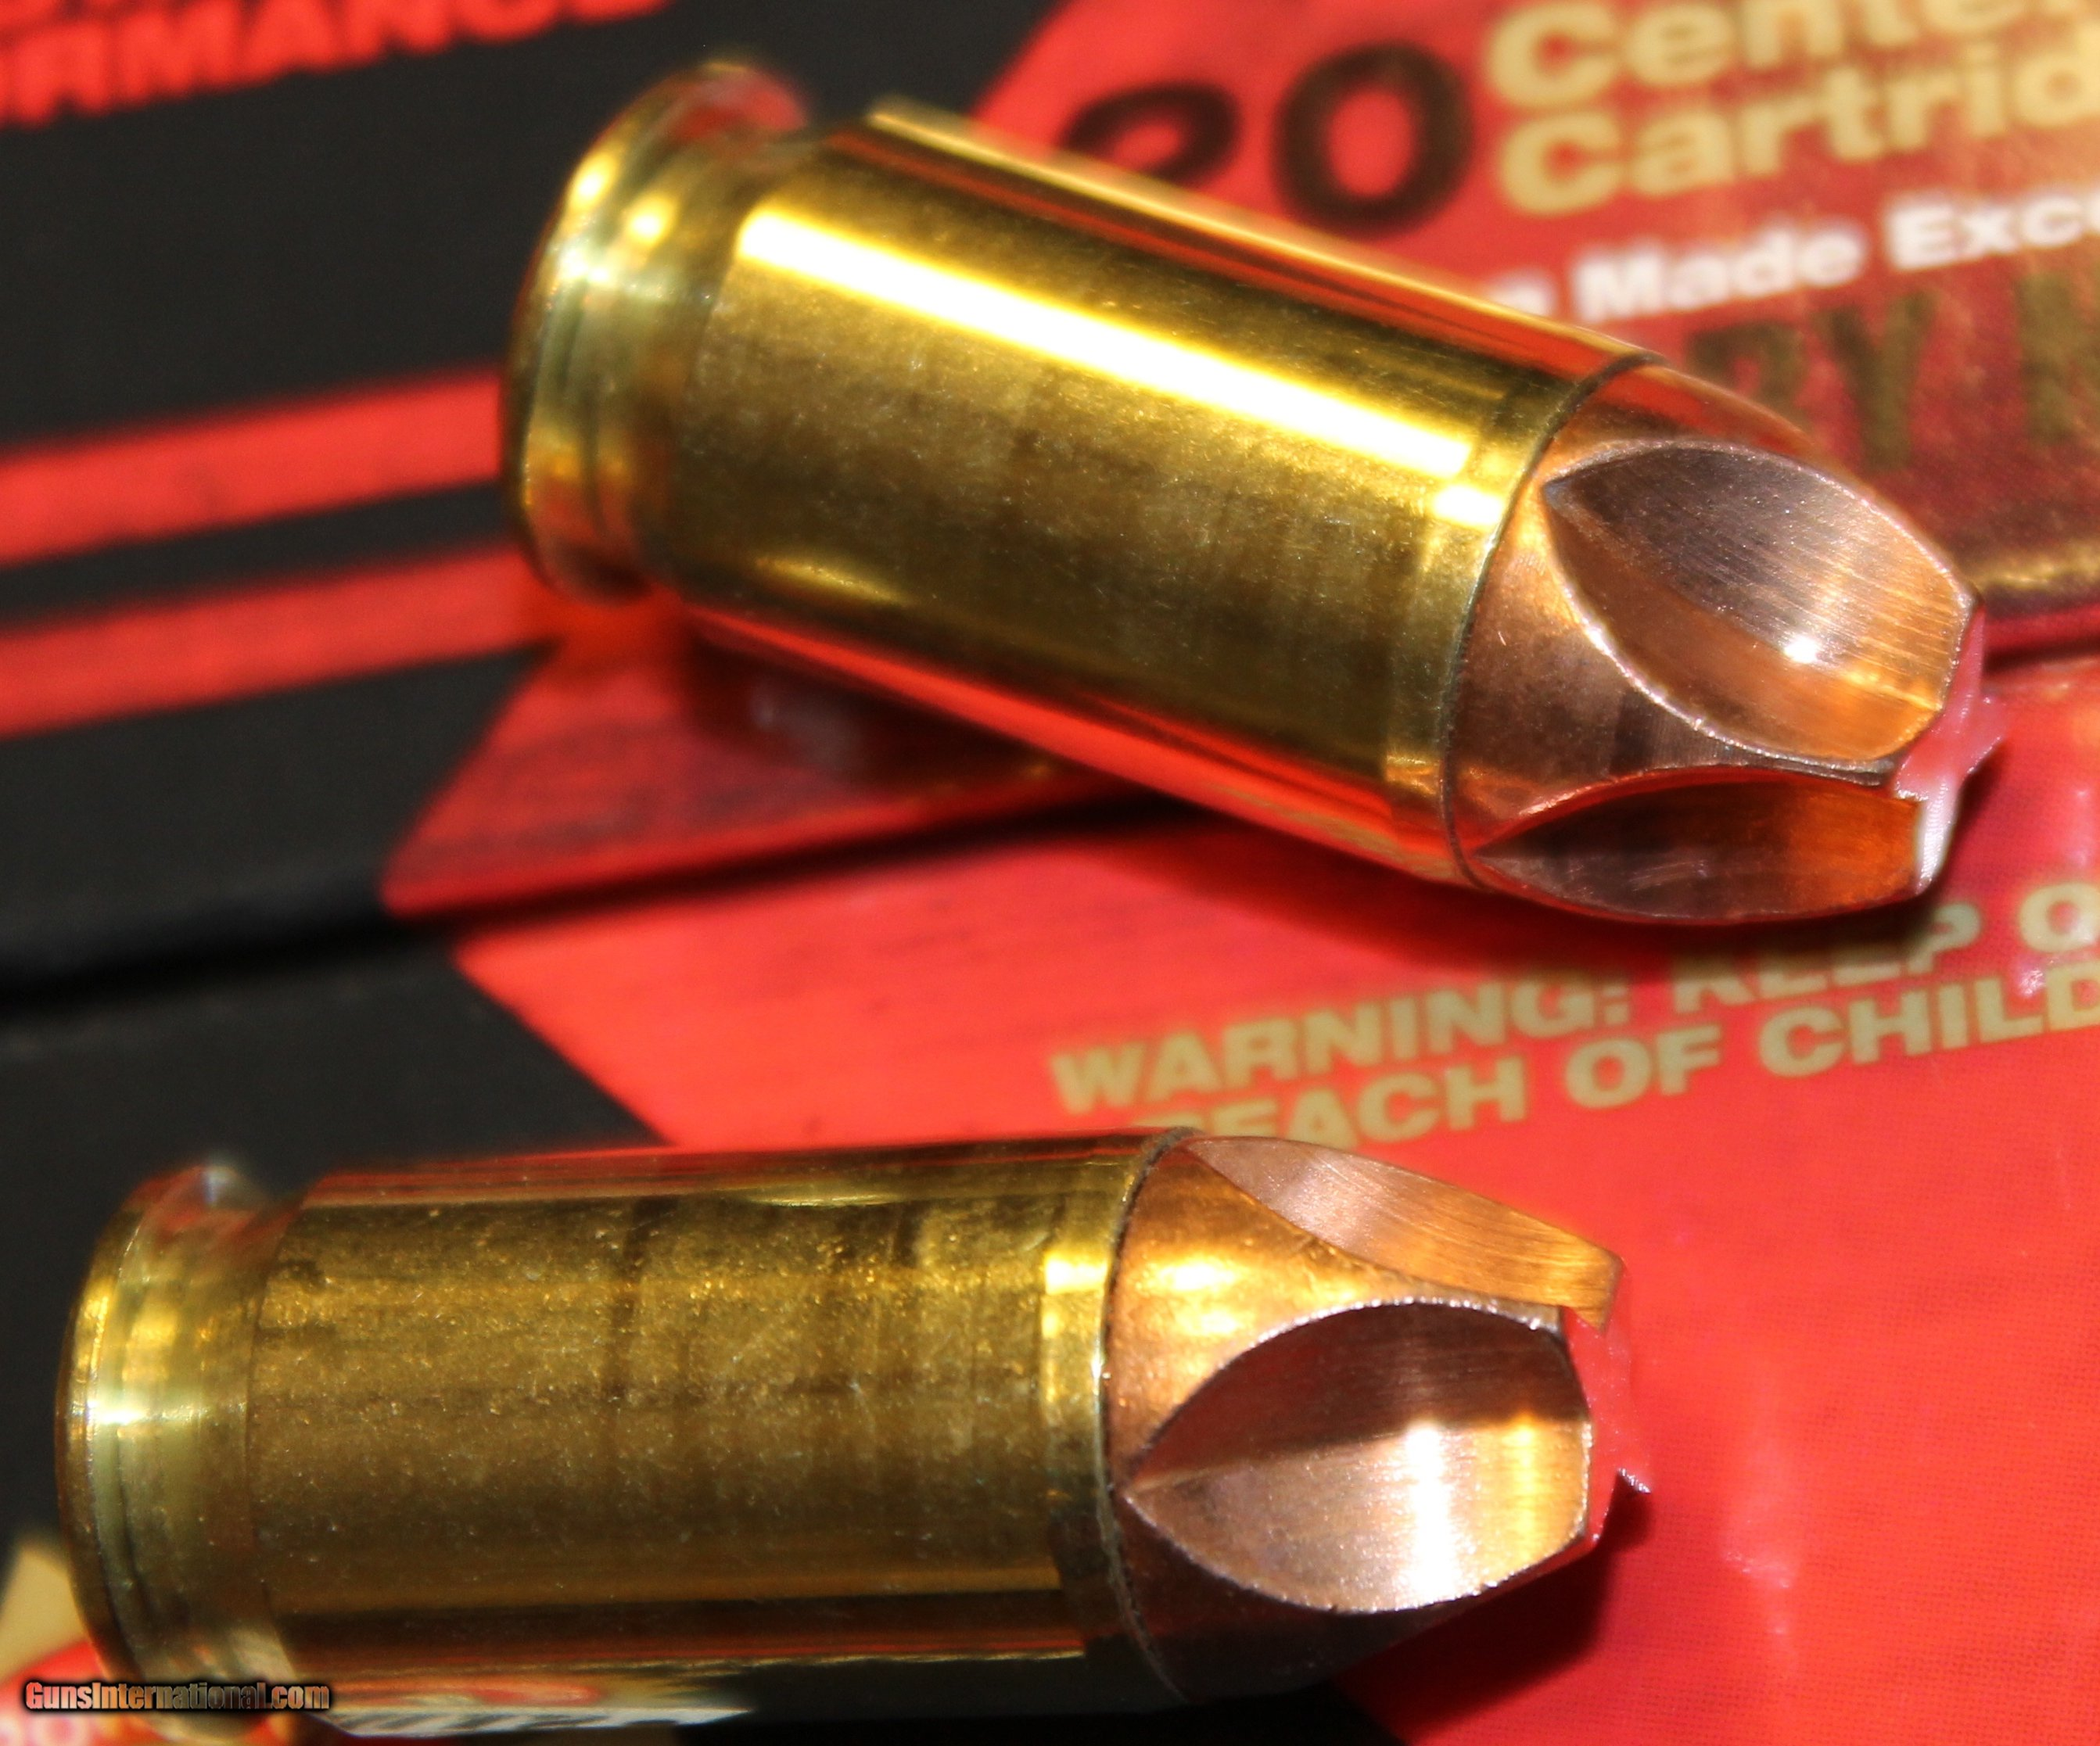 100 rounds of Black Hills 45 ACP 135 Gr HoneyBadger Handgun